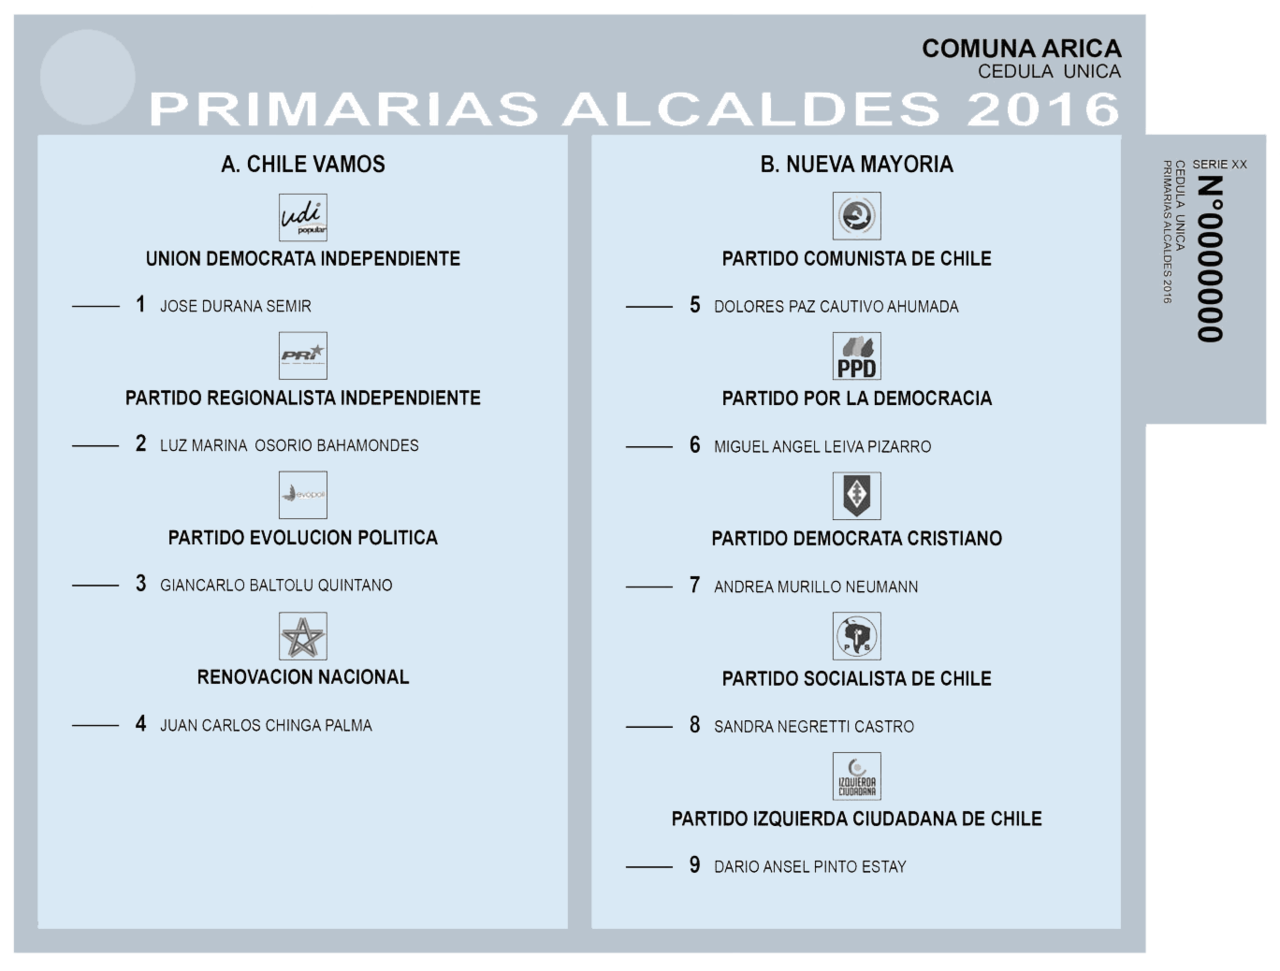 File:Cedula Unica Primarias Alcaldes 2016 Arica png